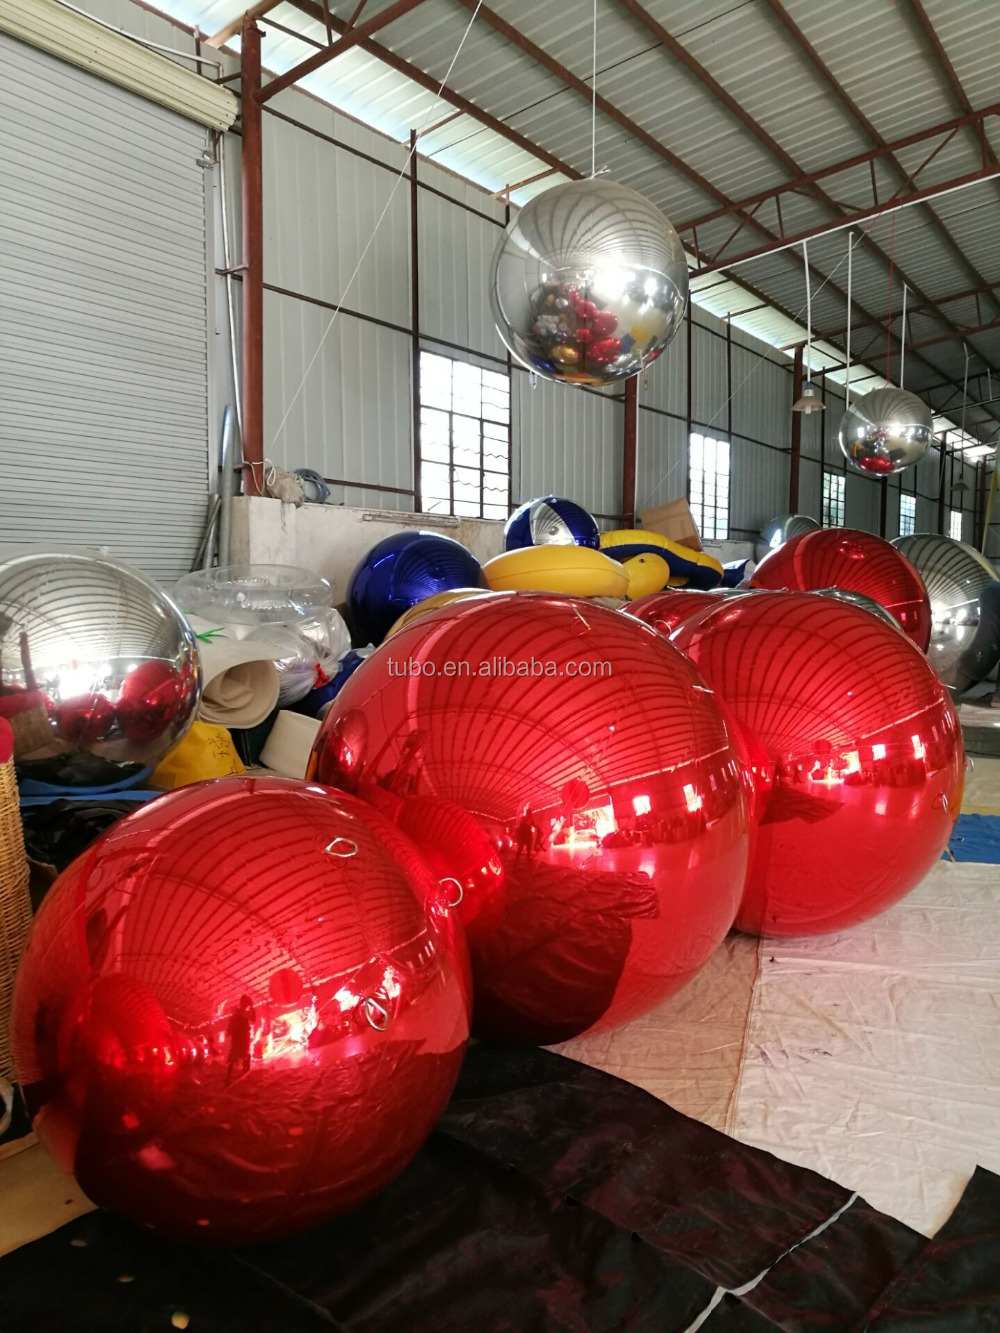 red-Inflatabla-Balloon-For-Advertising-font-b-Mirror-b-font-font-b-Ball-b-font-For.jpg